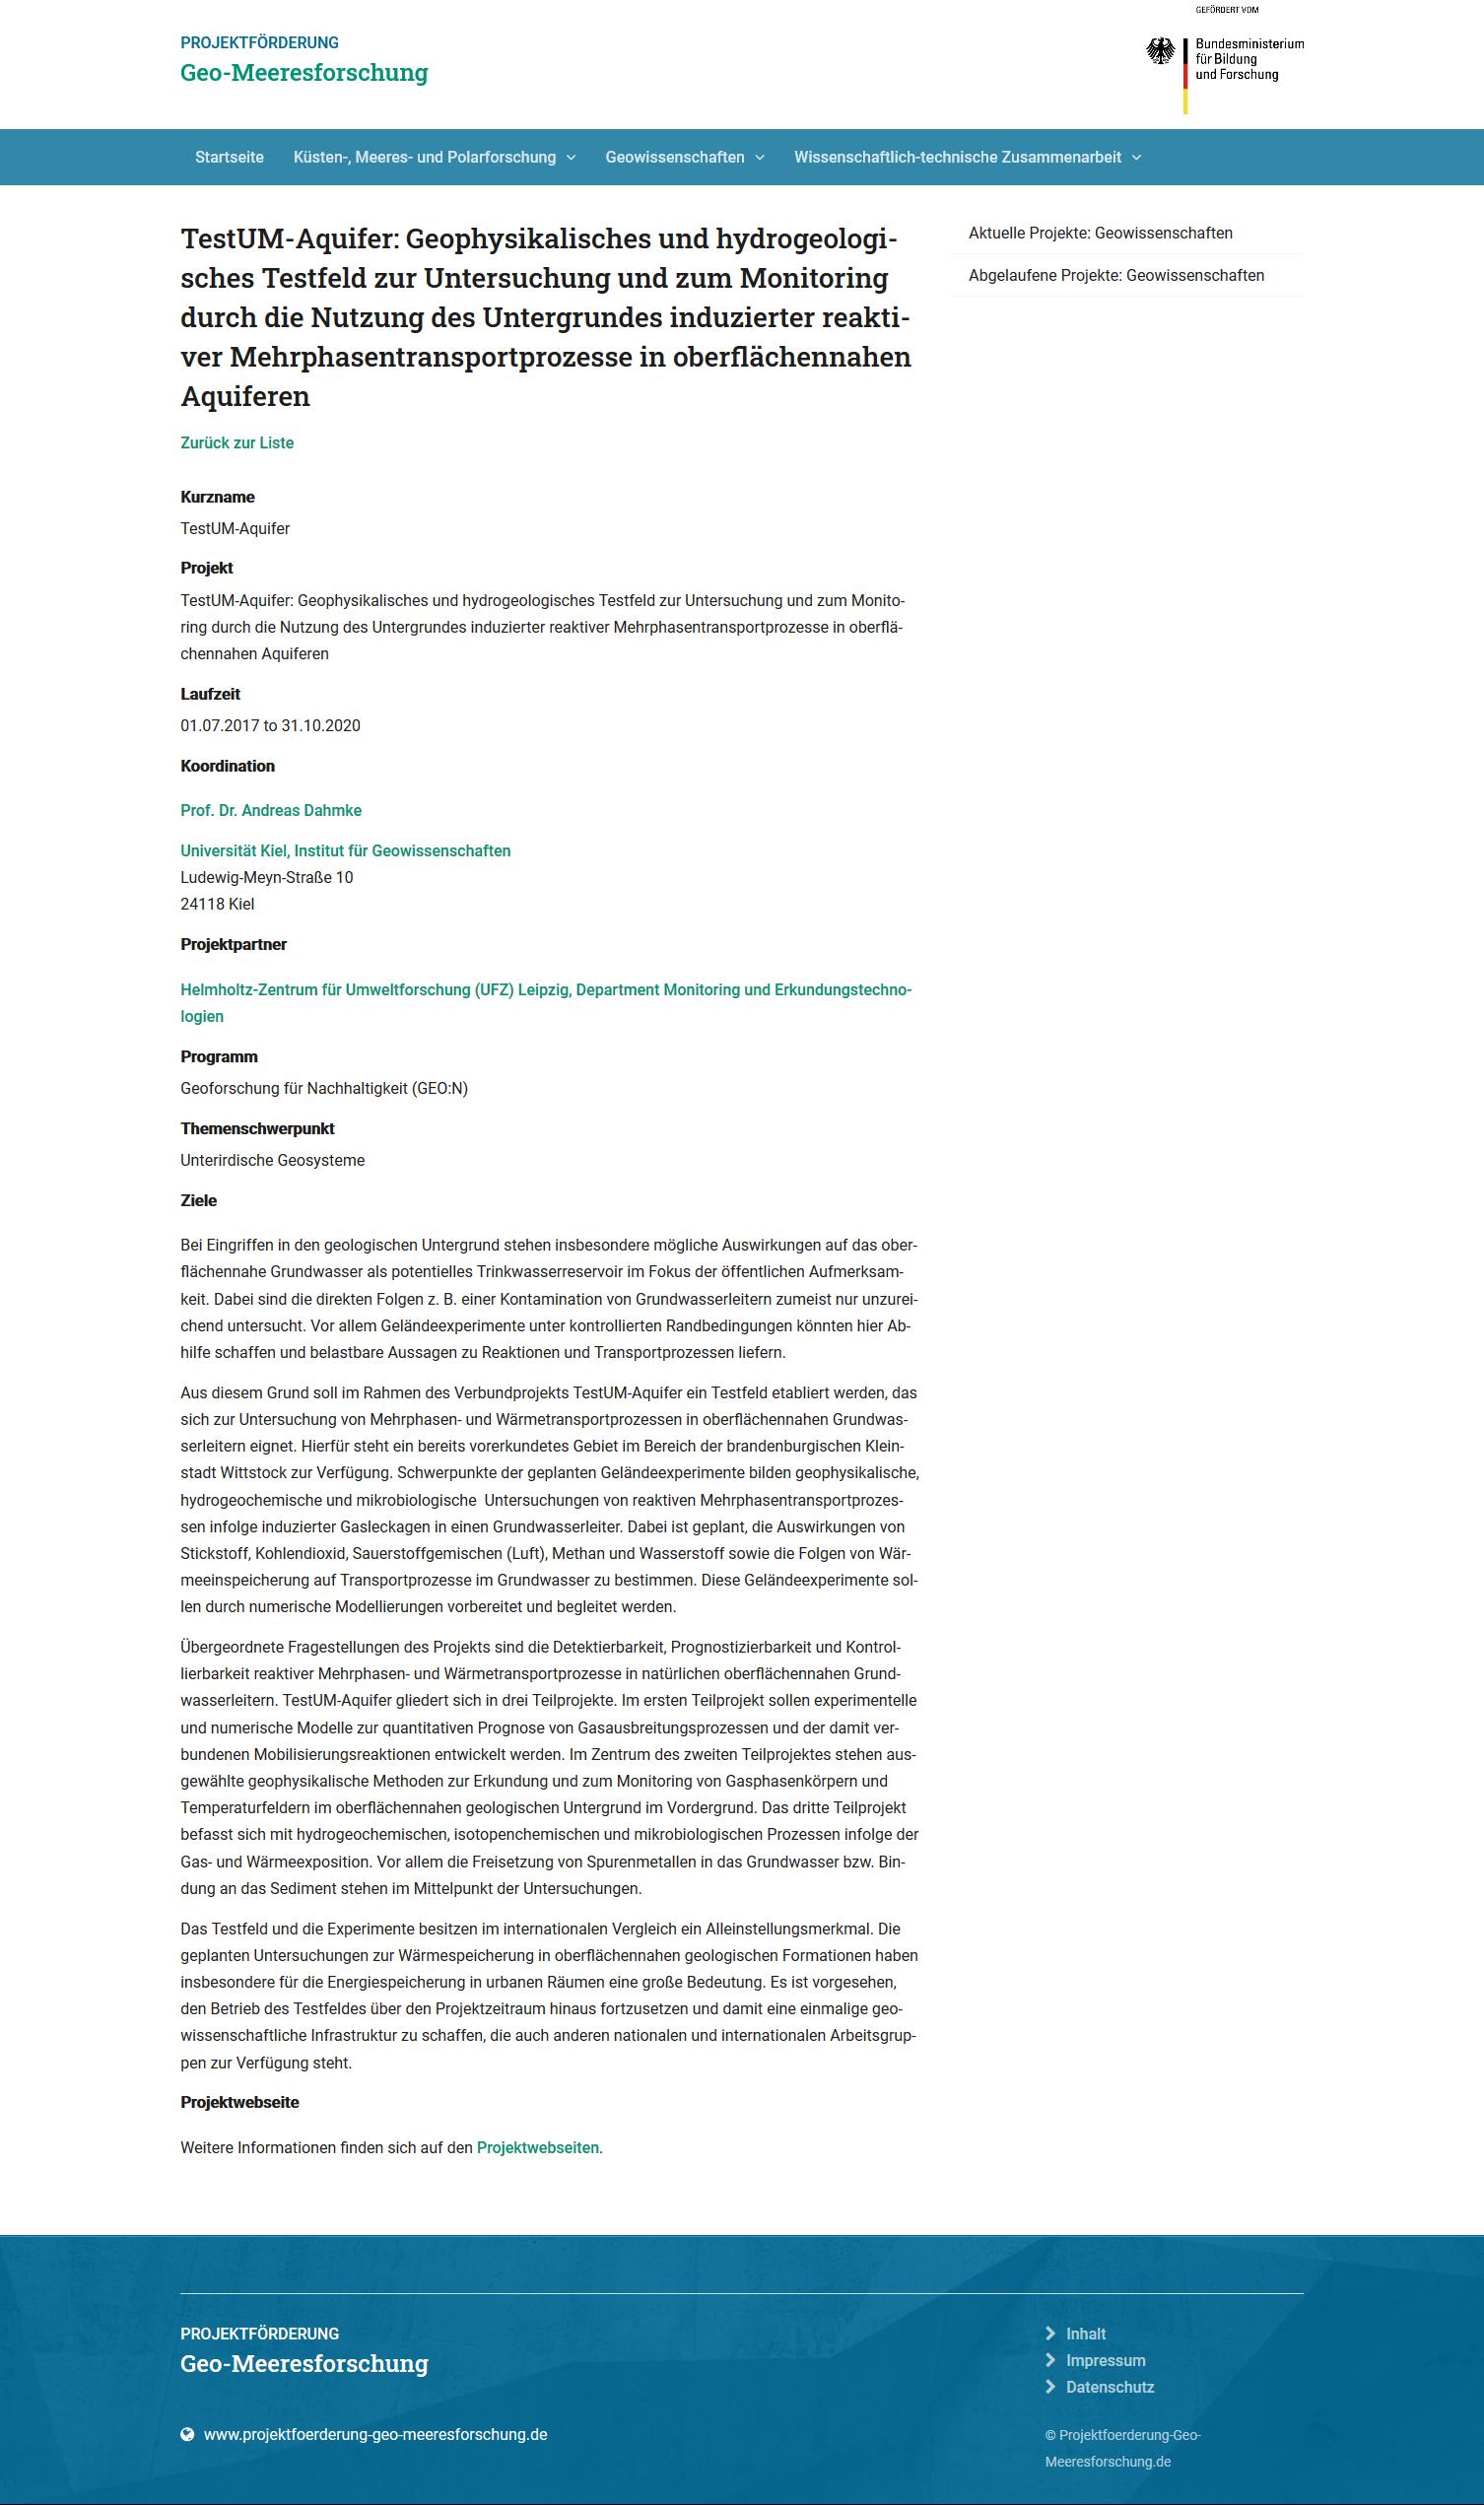 PRESSE Screenshot Geomeeresforschung